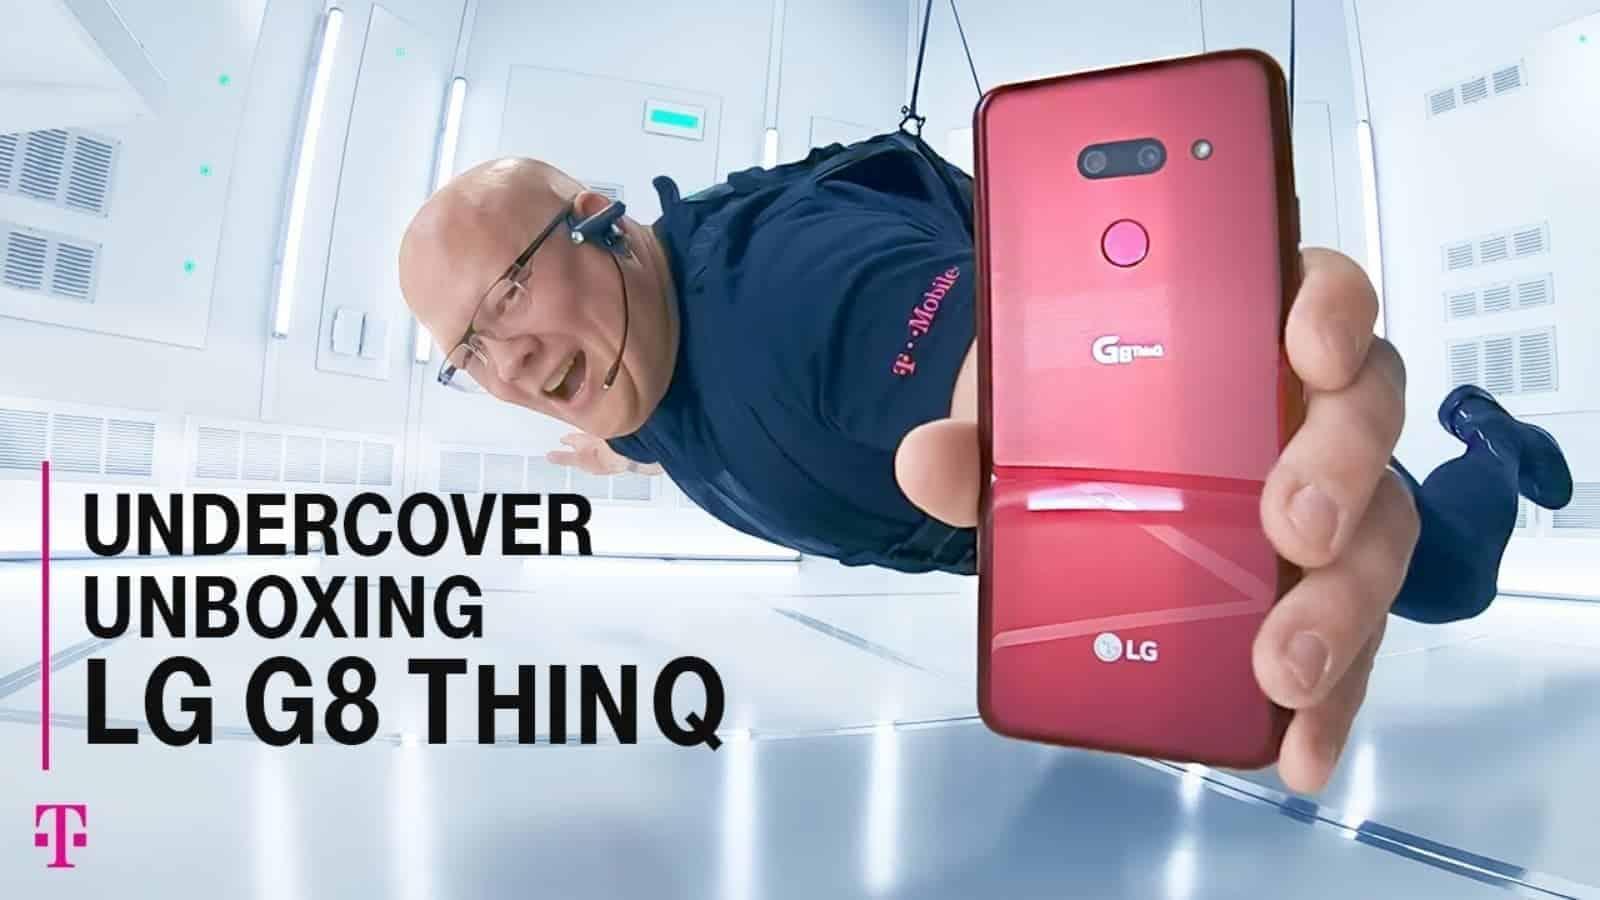 TMobile LG G8 ThinQ Unboxing